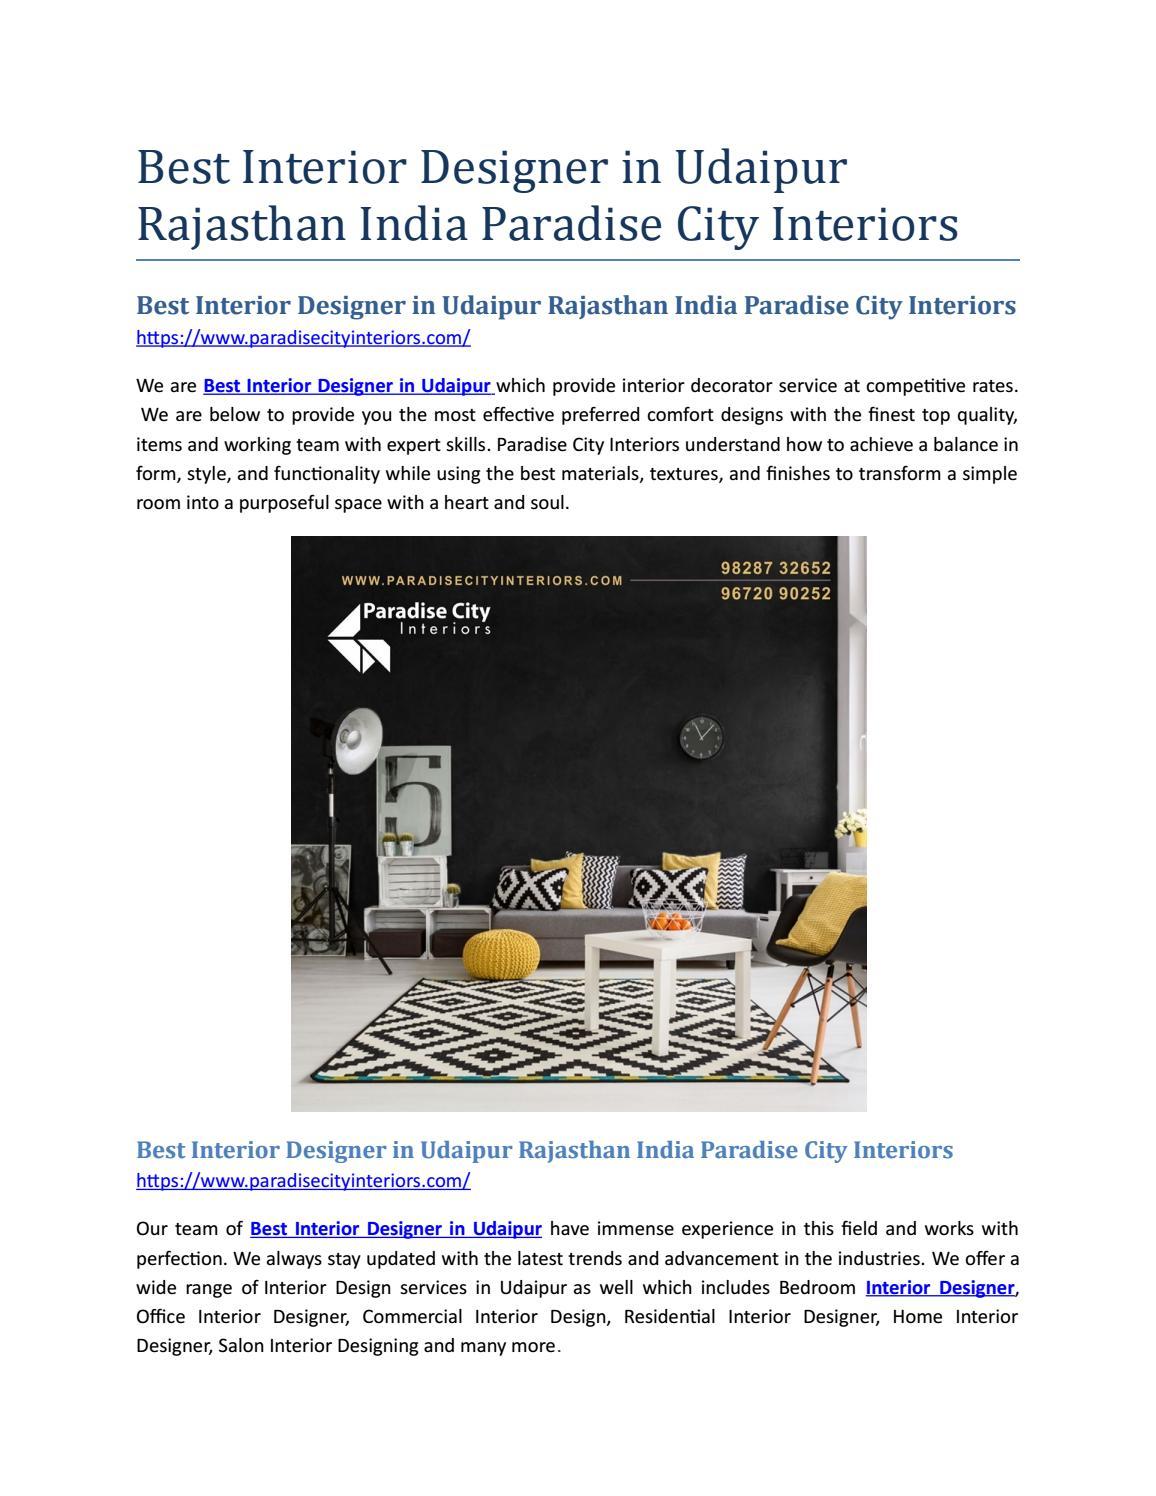 Best Interior Designer In Udaipur Rajasthan India Paradise City Interiors By Anjali Matrix11 Issuu